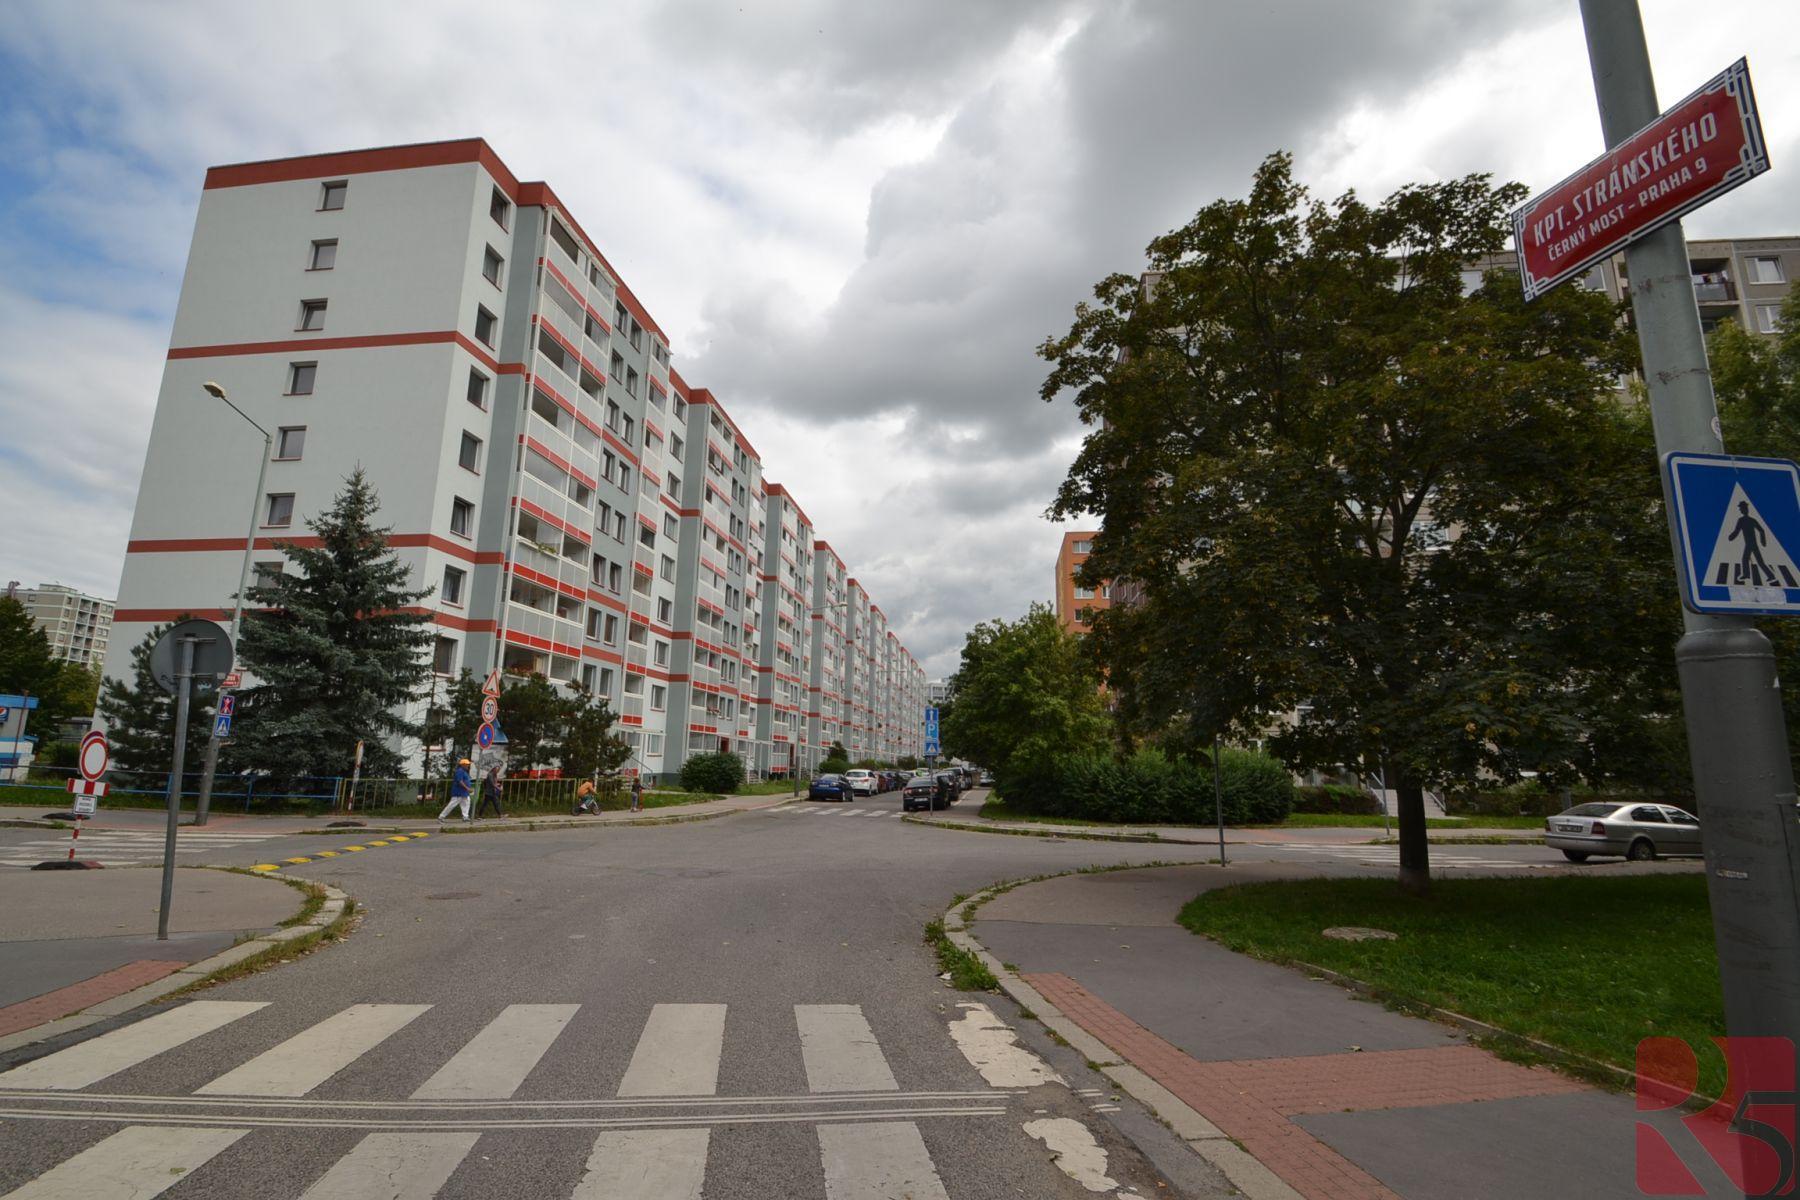 Prodej 2kk 44m2, P9 Černý Most, ul. Vybíralova, lodžie 2,8m2